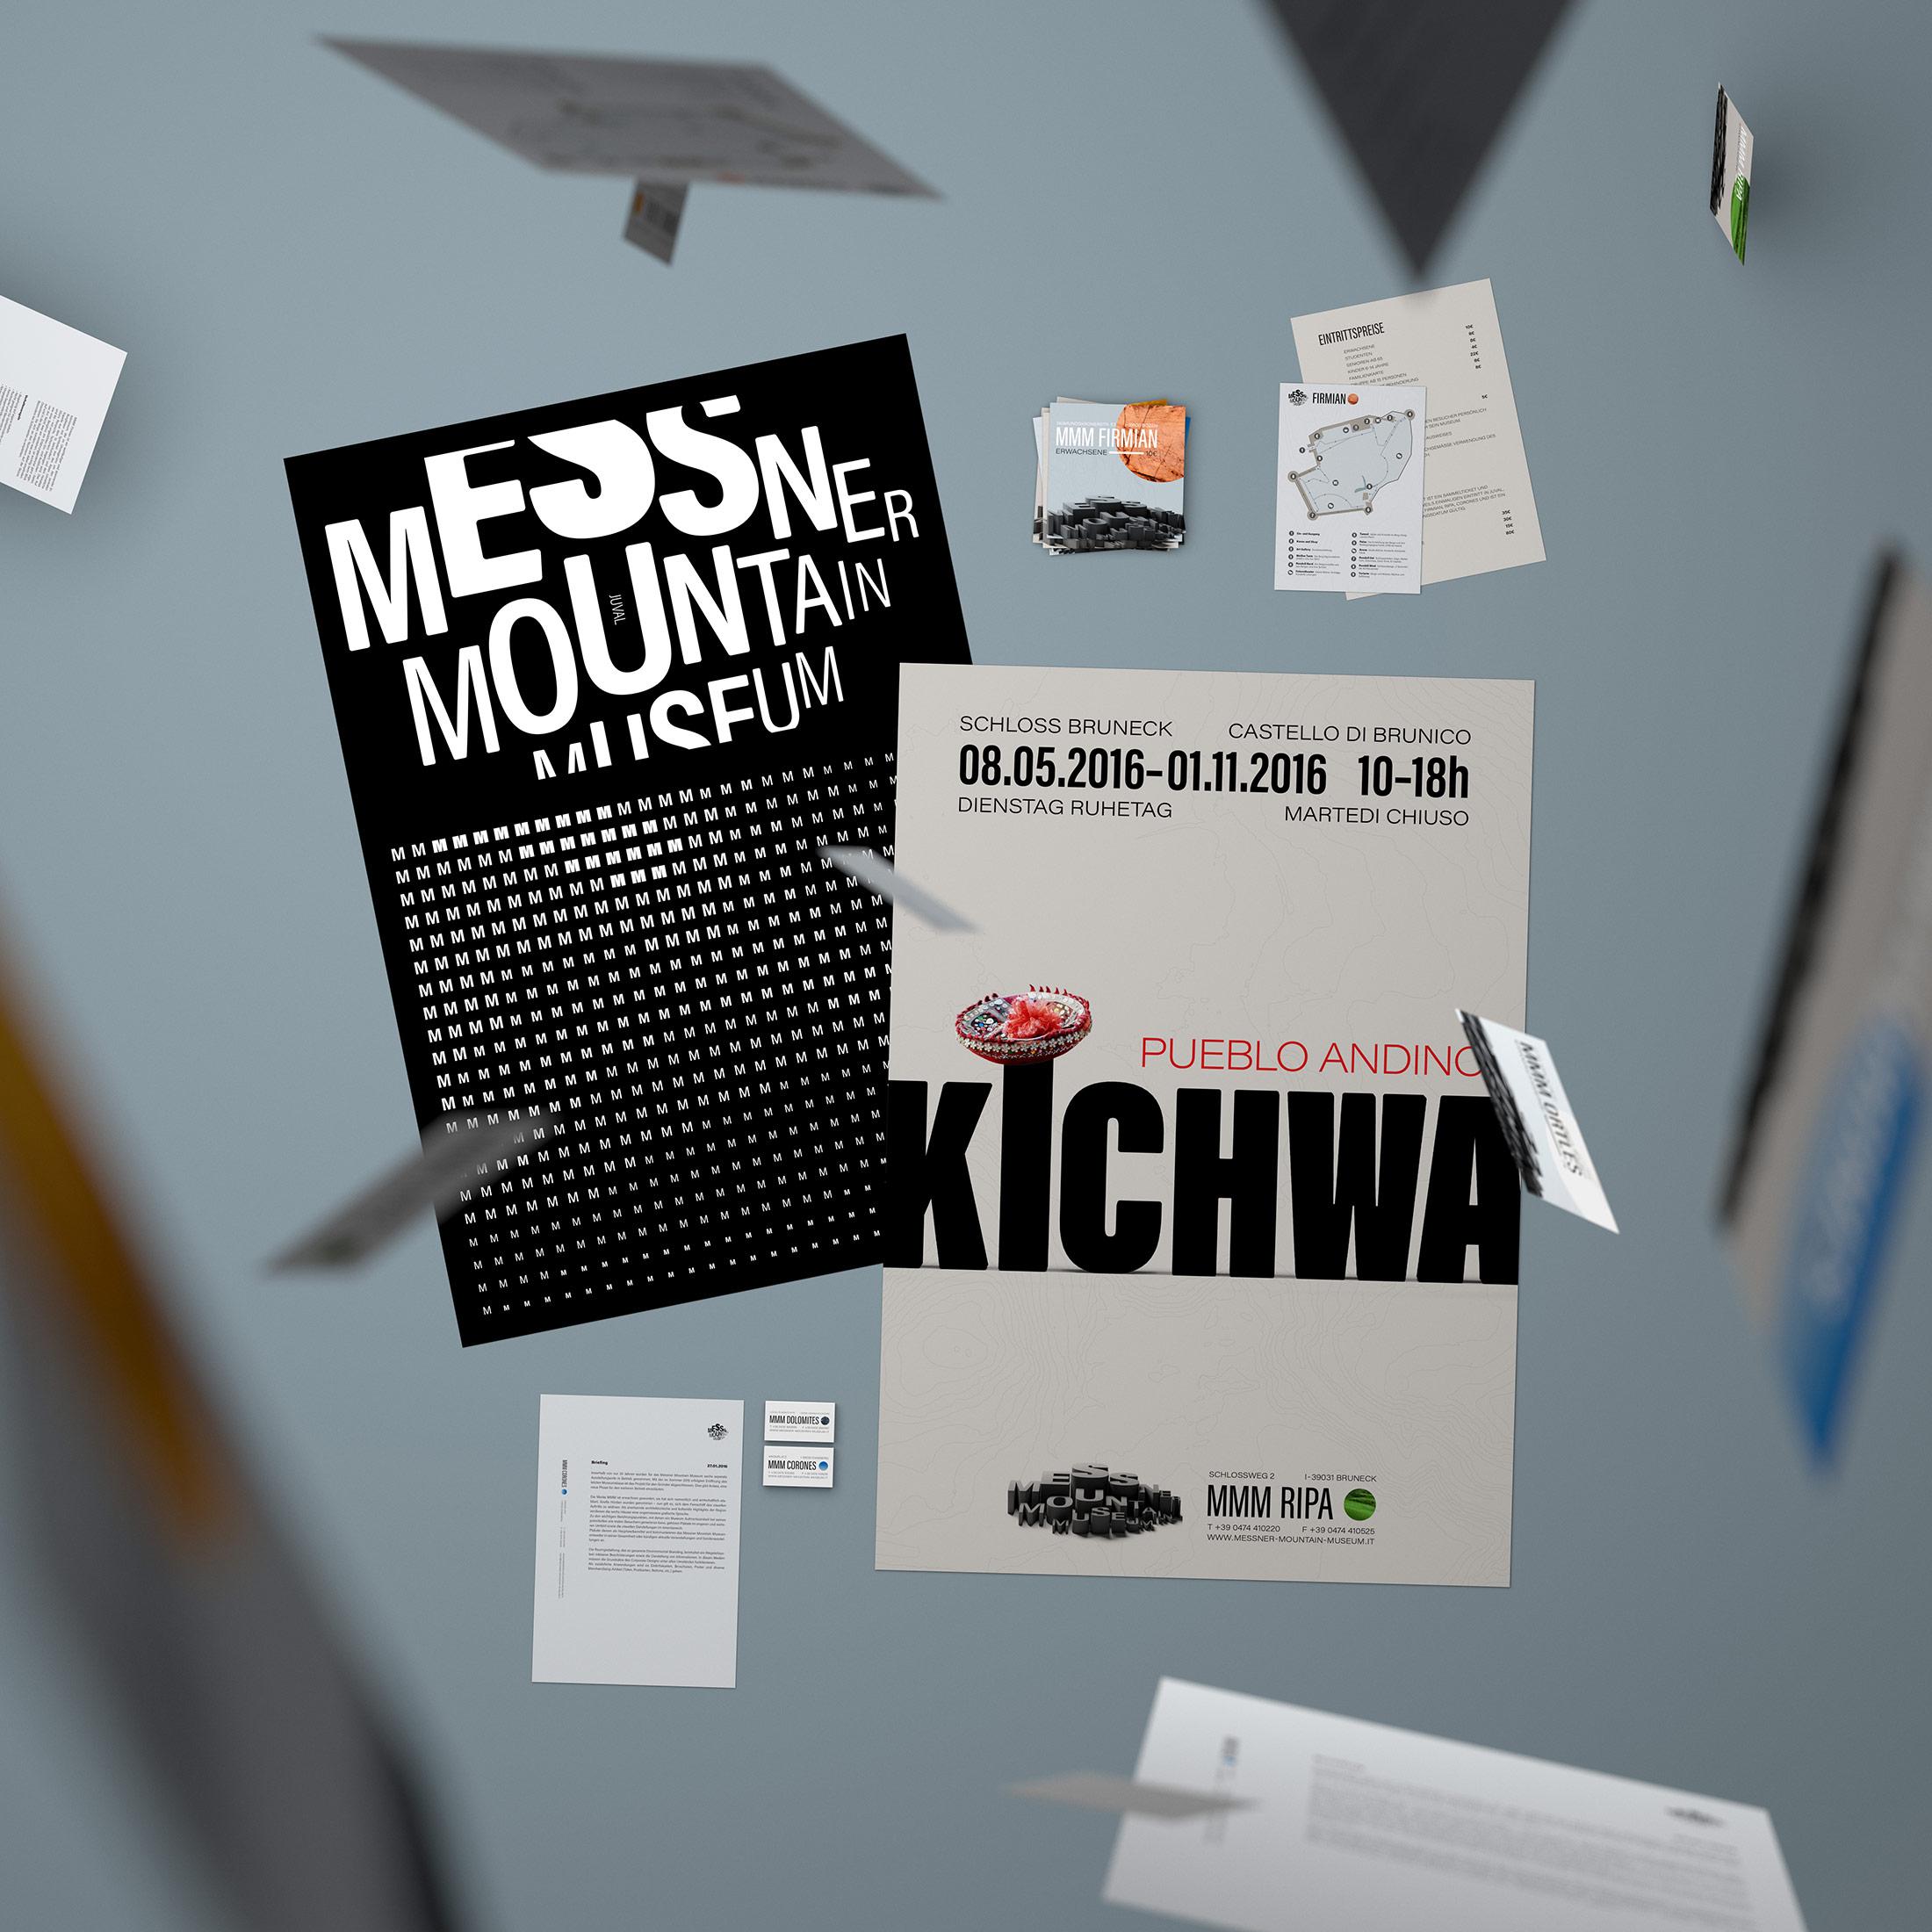 Messner_Mountain_Museum_01-Mitja_Schneehage